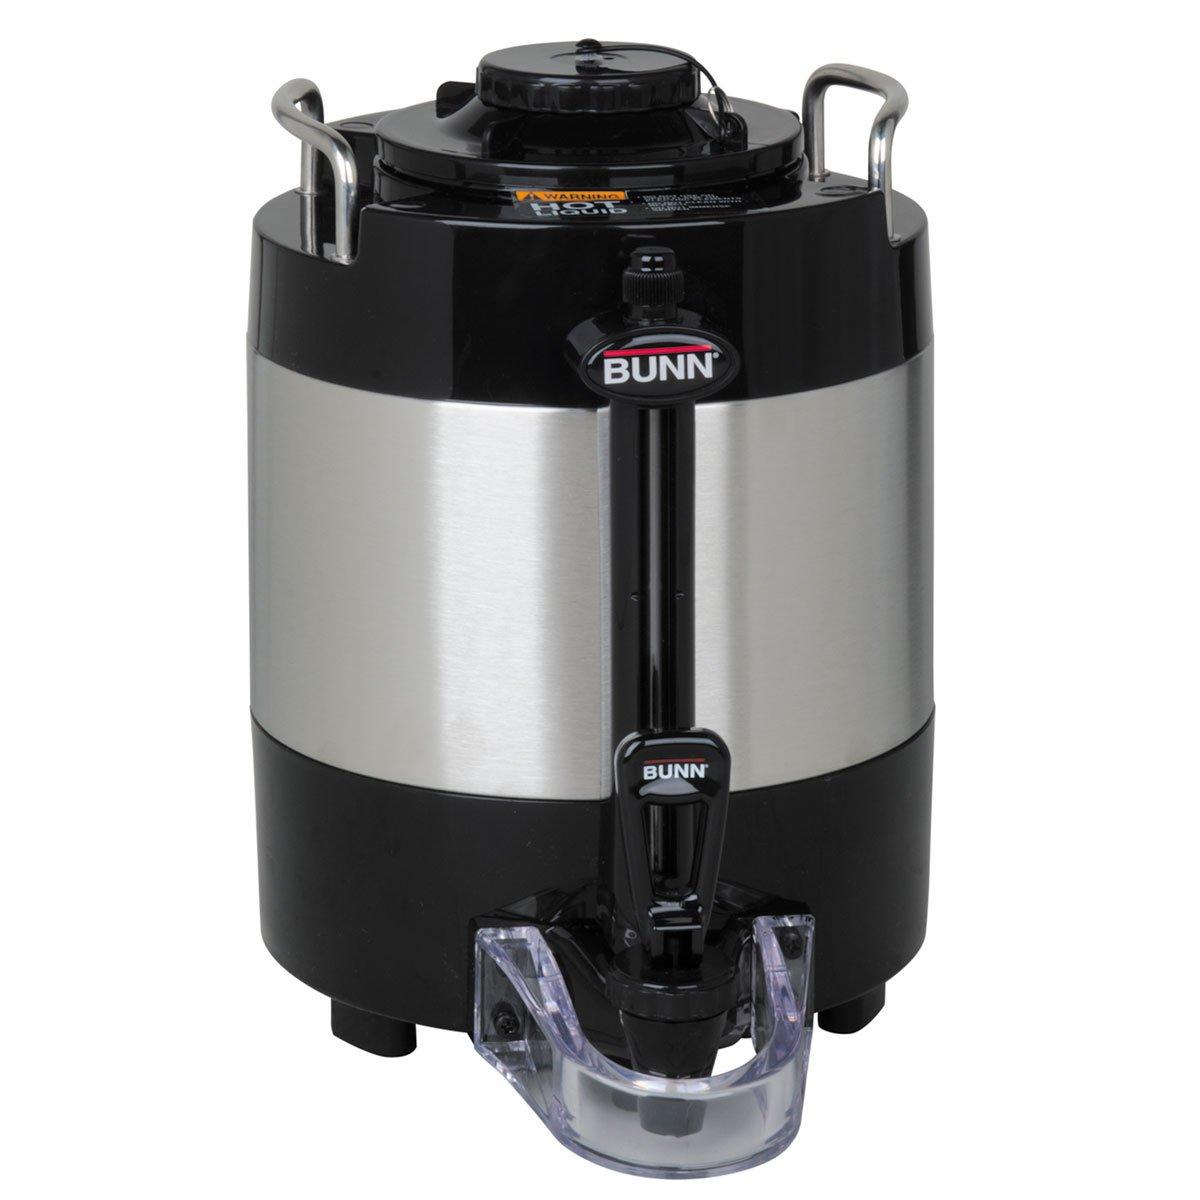 Bunn - 44000.0050 - Thermofresh 1 Gallon Stainless Steel Server by Bunn